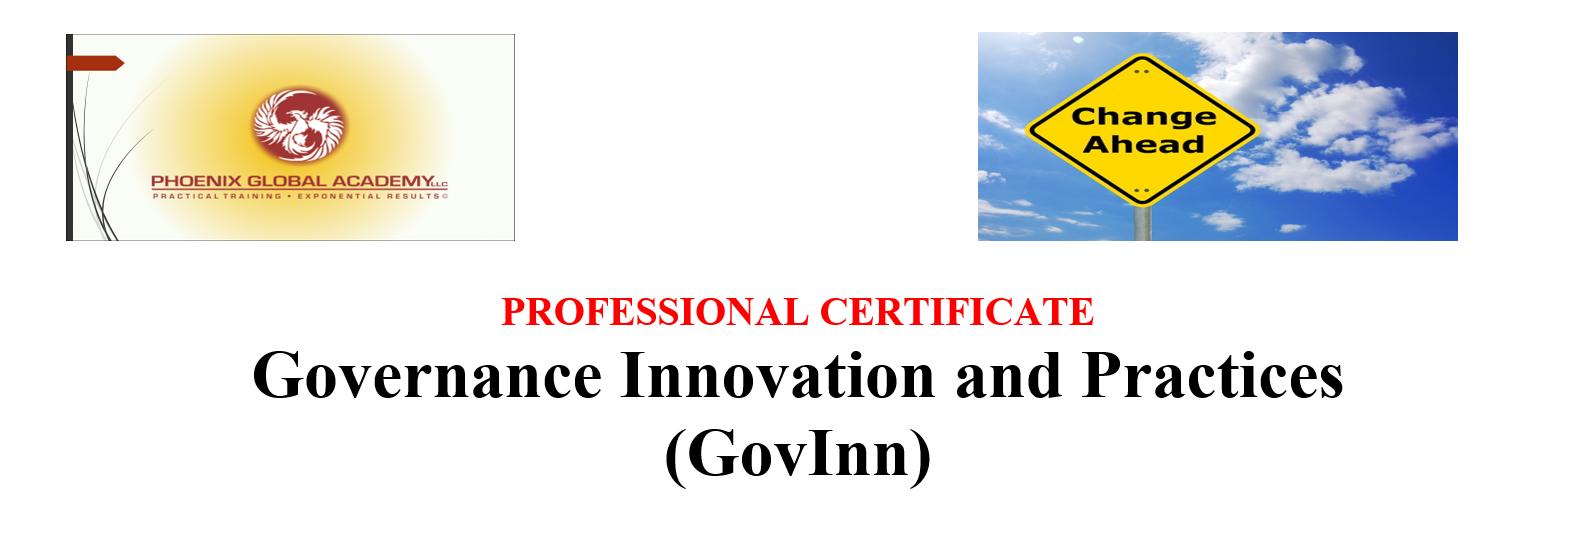 Governance Innovation and Practices (GovInn)